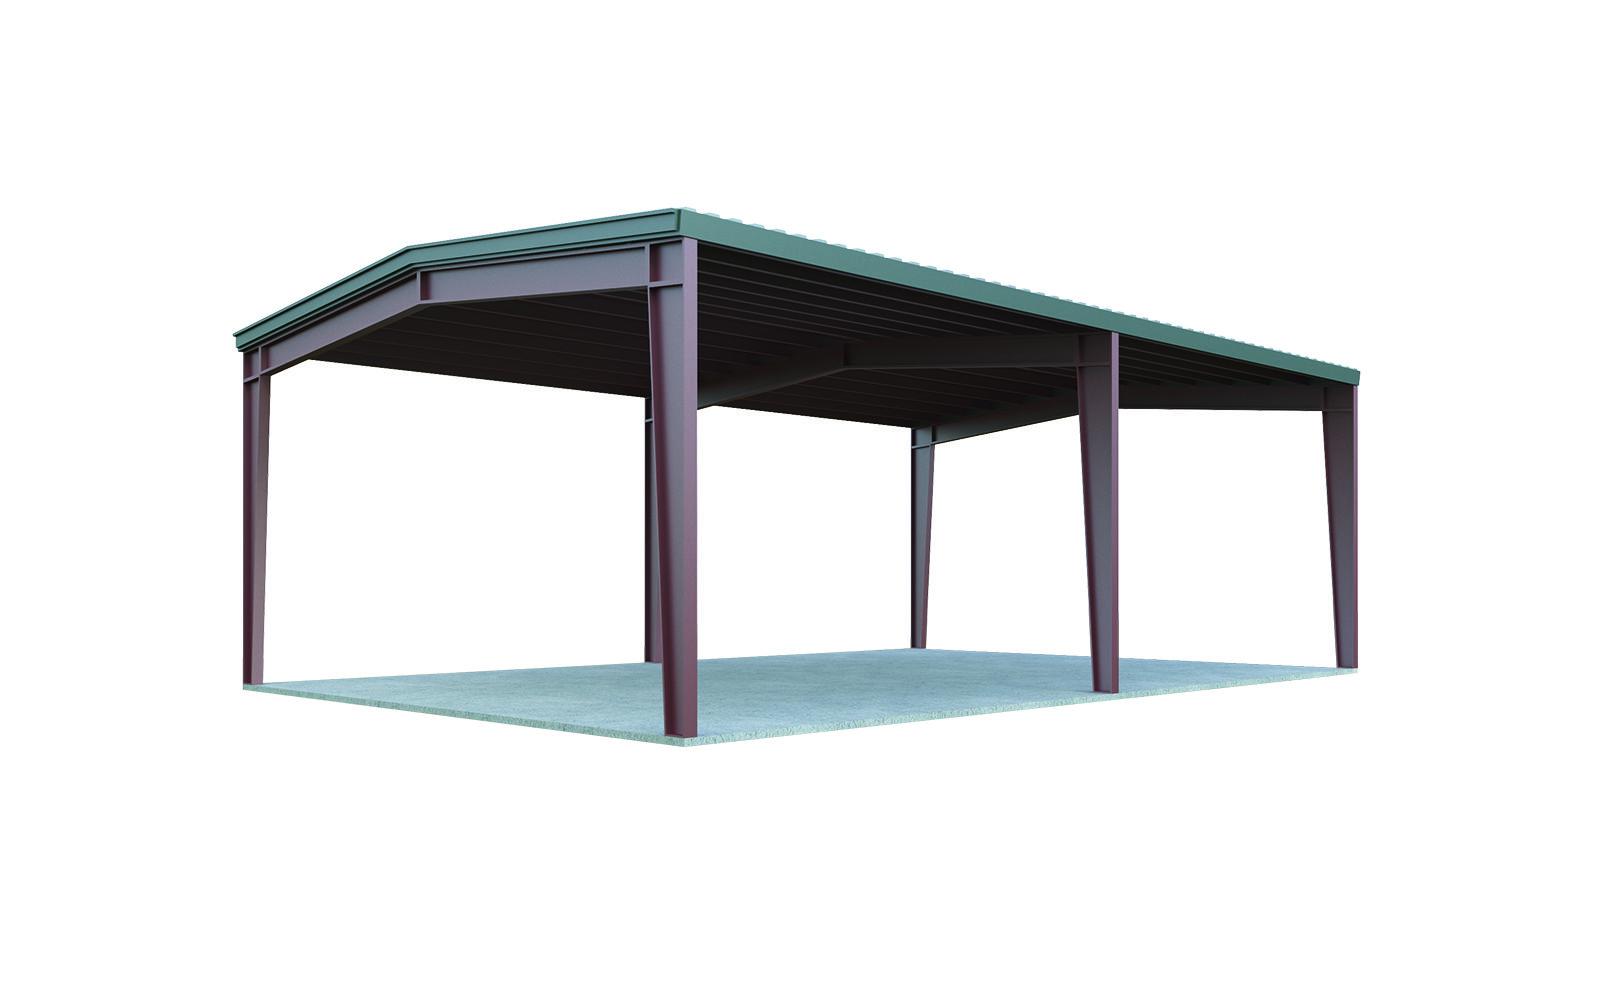 30x30 Carport Quick Prices With Images Carport Steel Carports General Steel